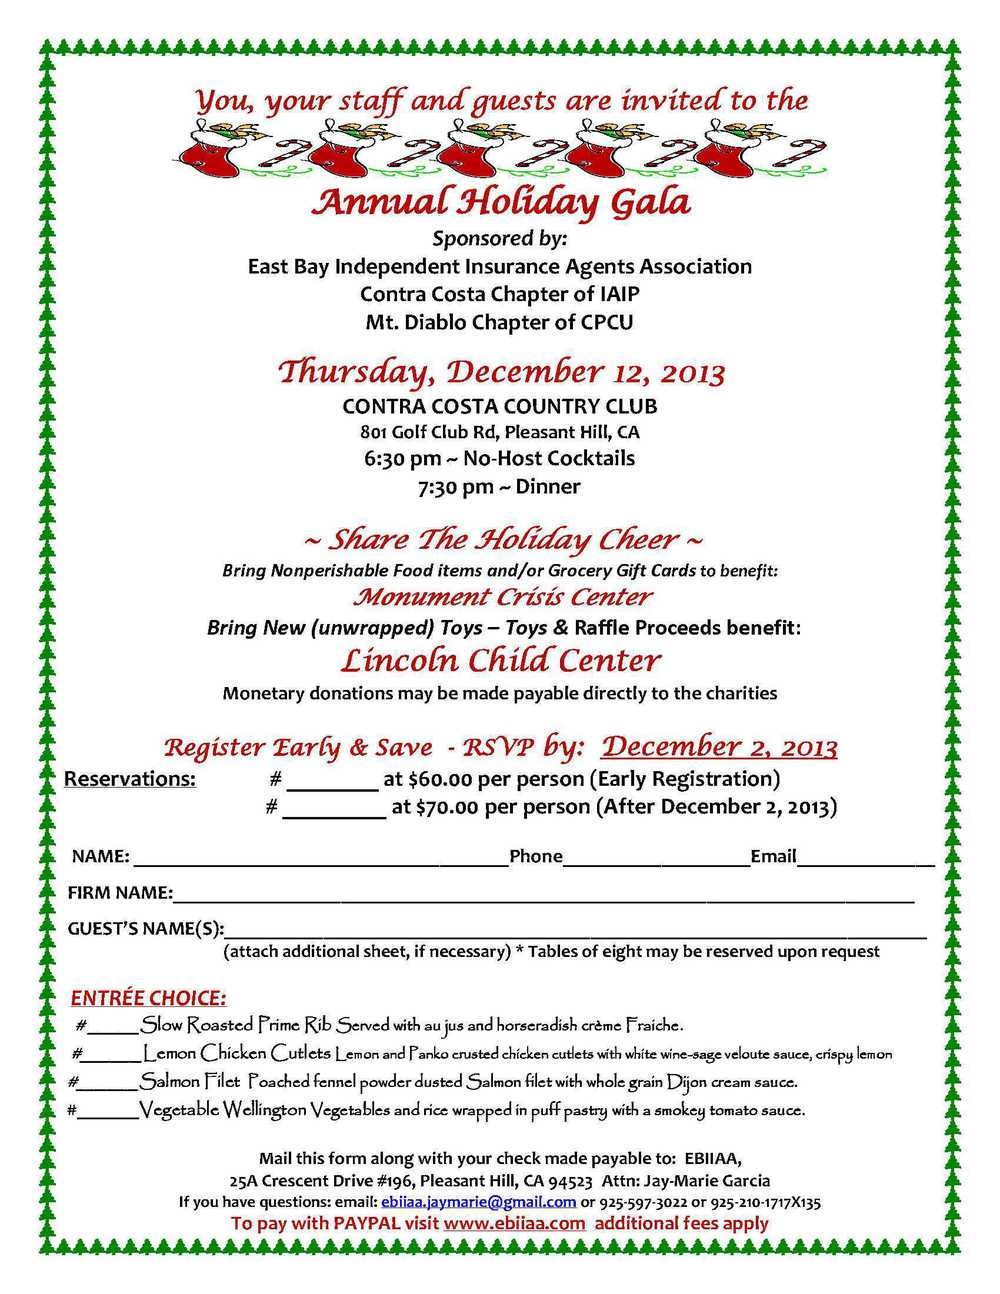 2013_holiday_gala_invite CCCIAIP.jpg